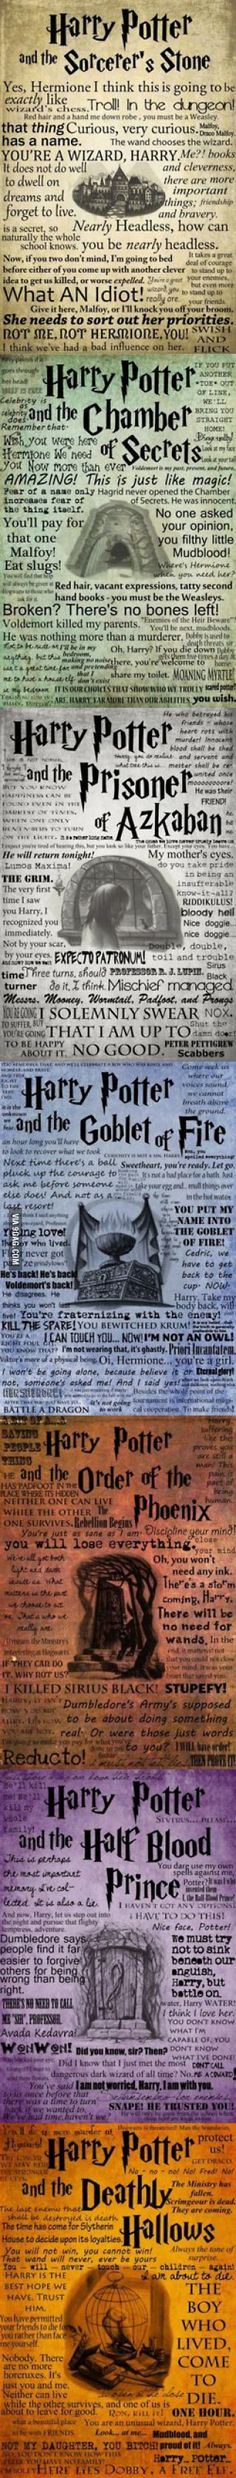 9GAG - Harry Potter = Most Epic